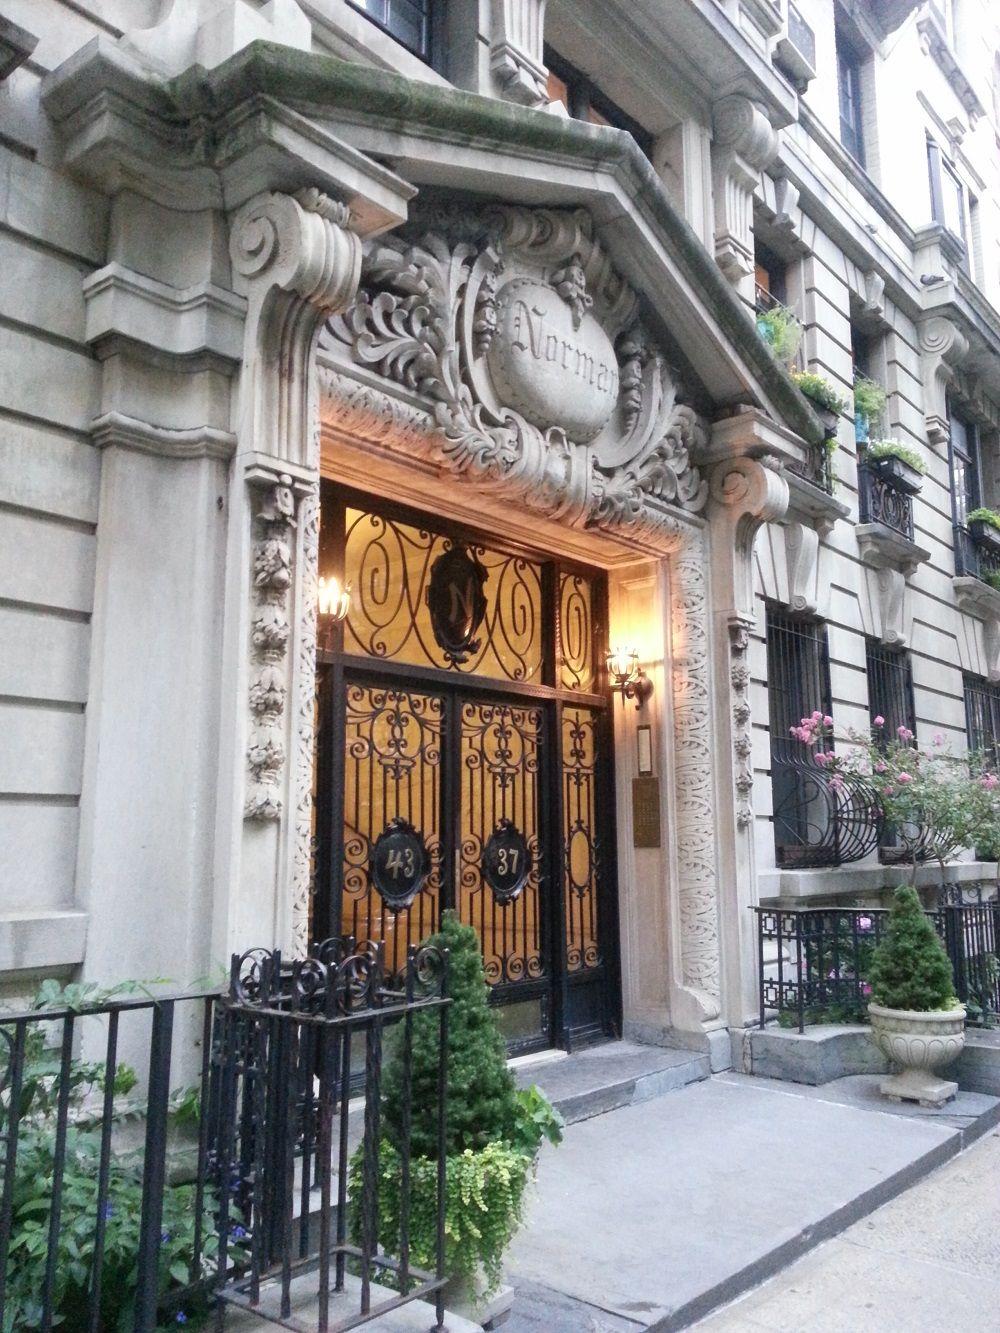 Home away new york upper east side